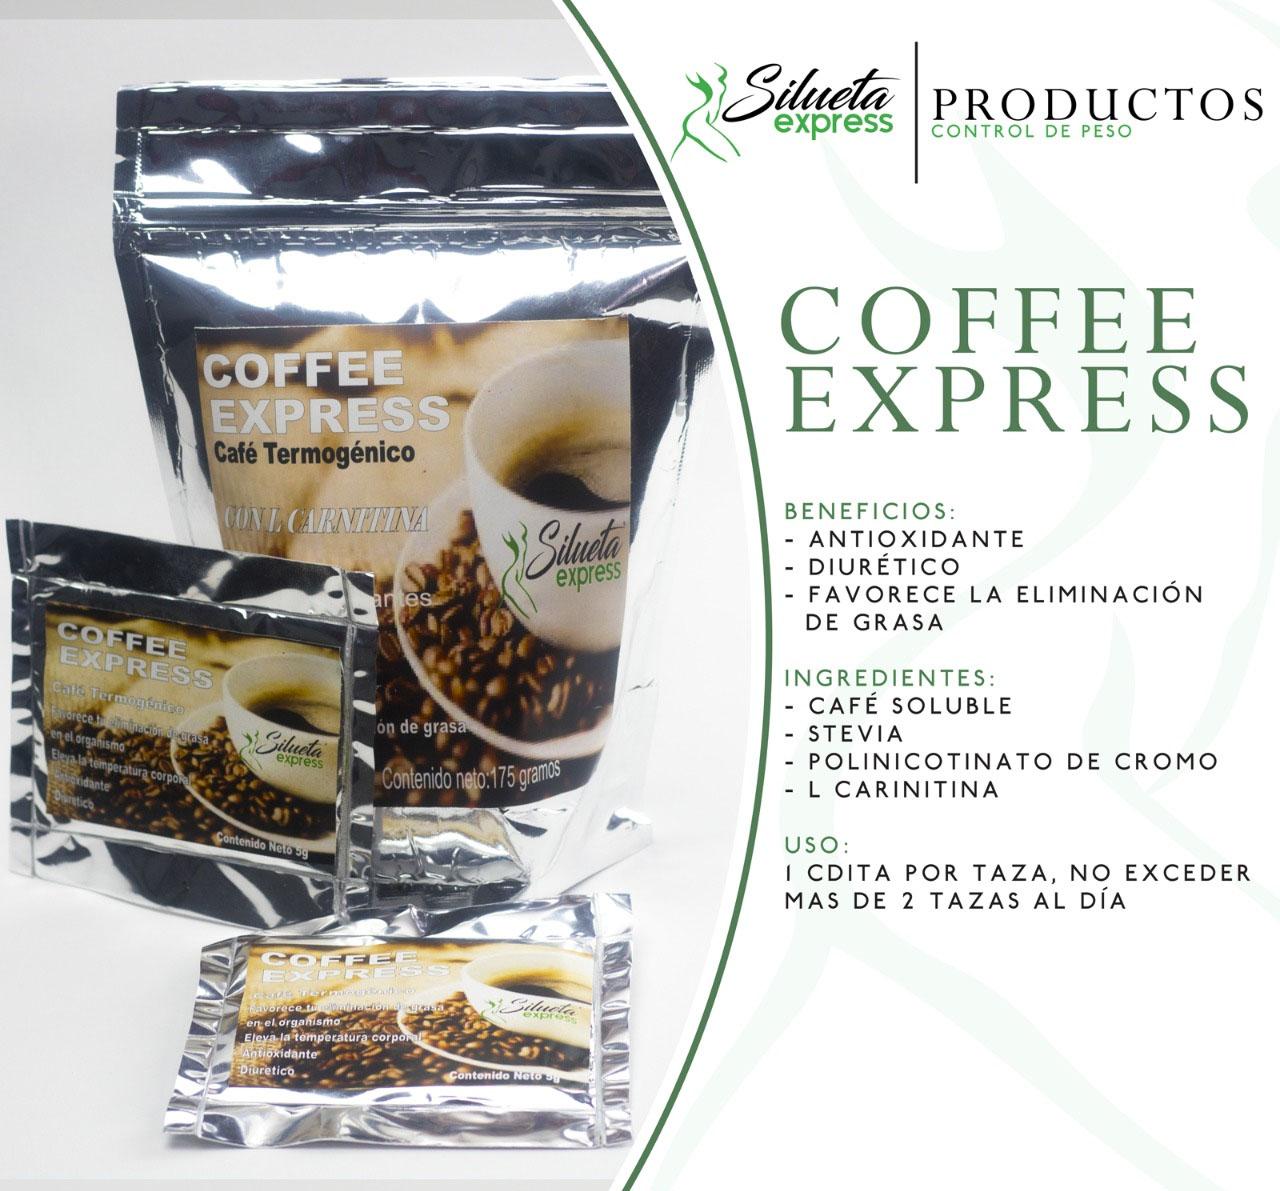 coffee express silueta